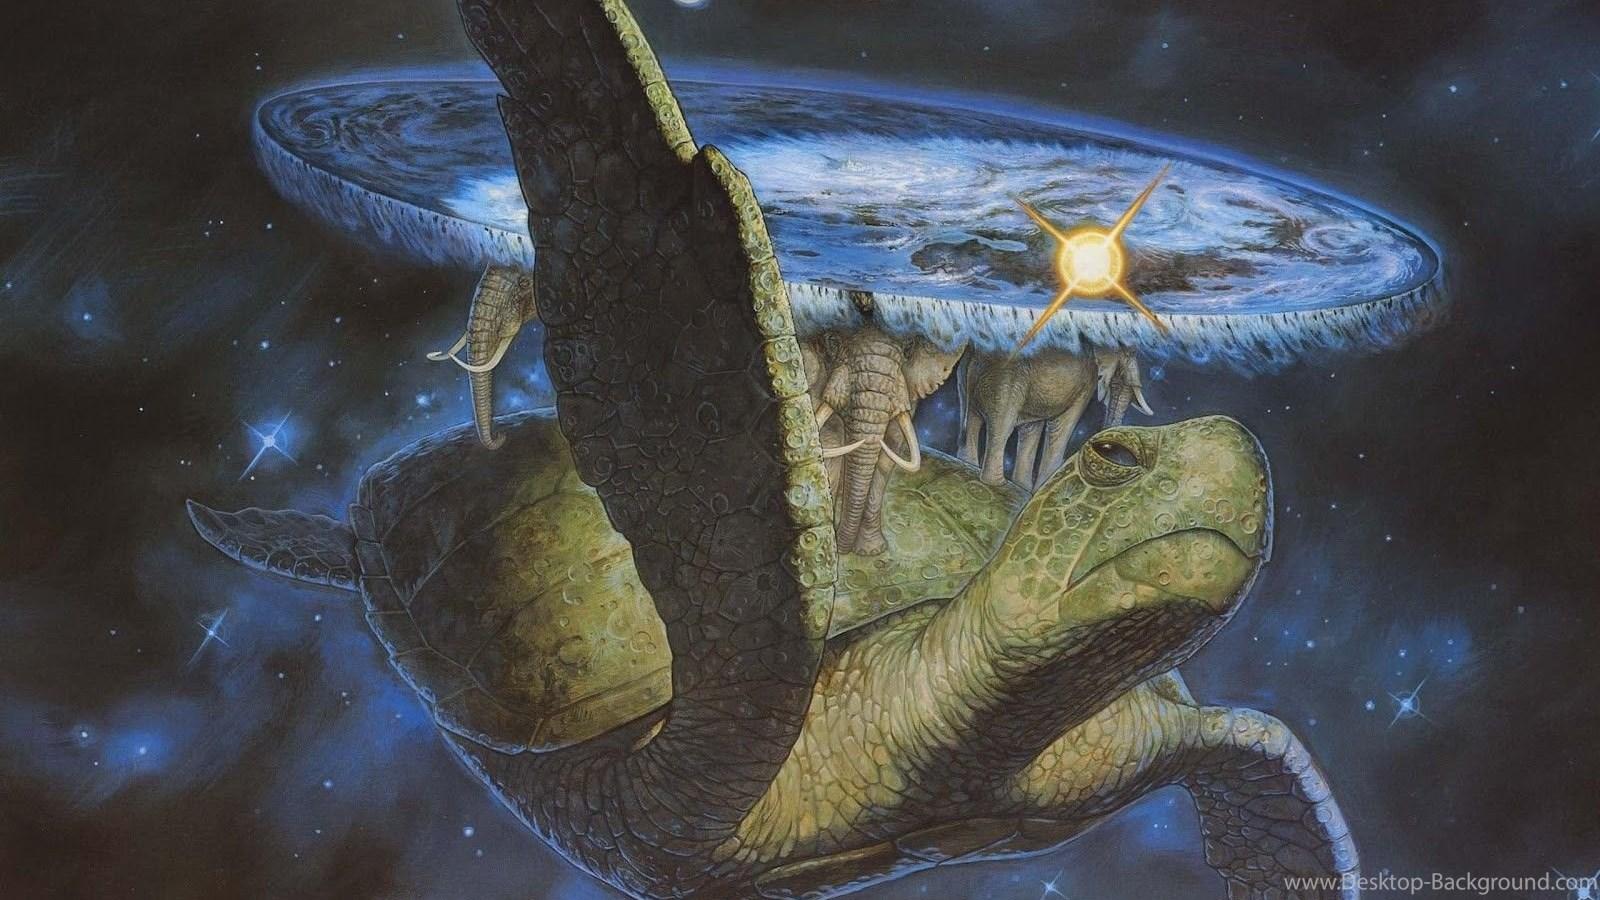 Popular   Terry Pratchett The Last Hero Illustrations Hd 1600x900